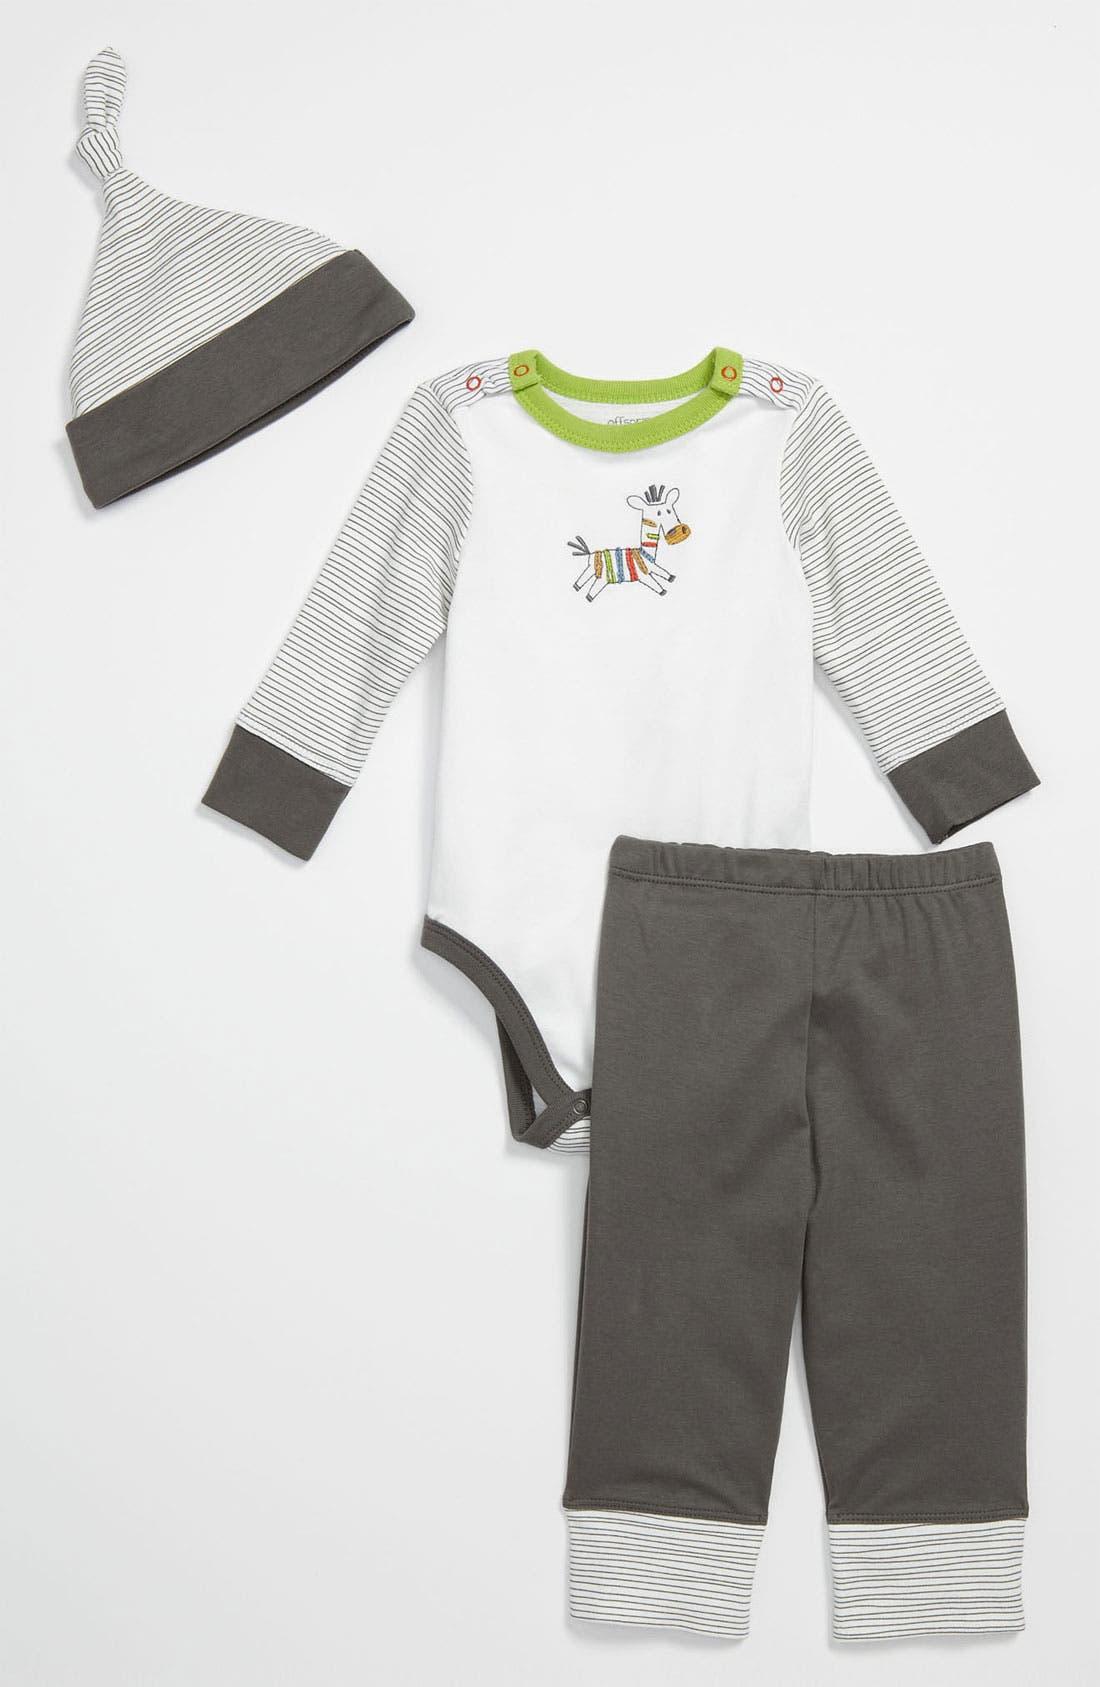 Main Image - Offspring Bodysuit & Pants (Infant)